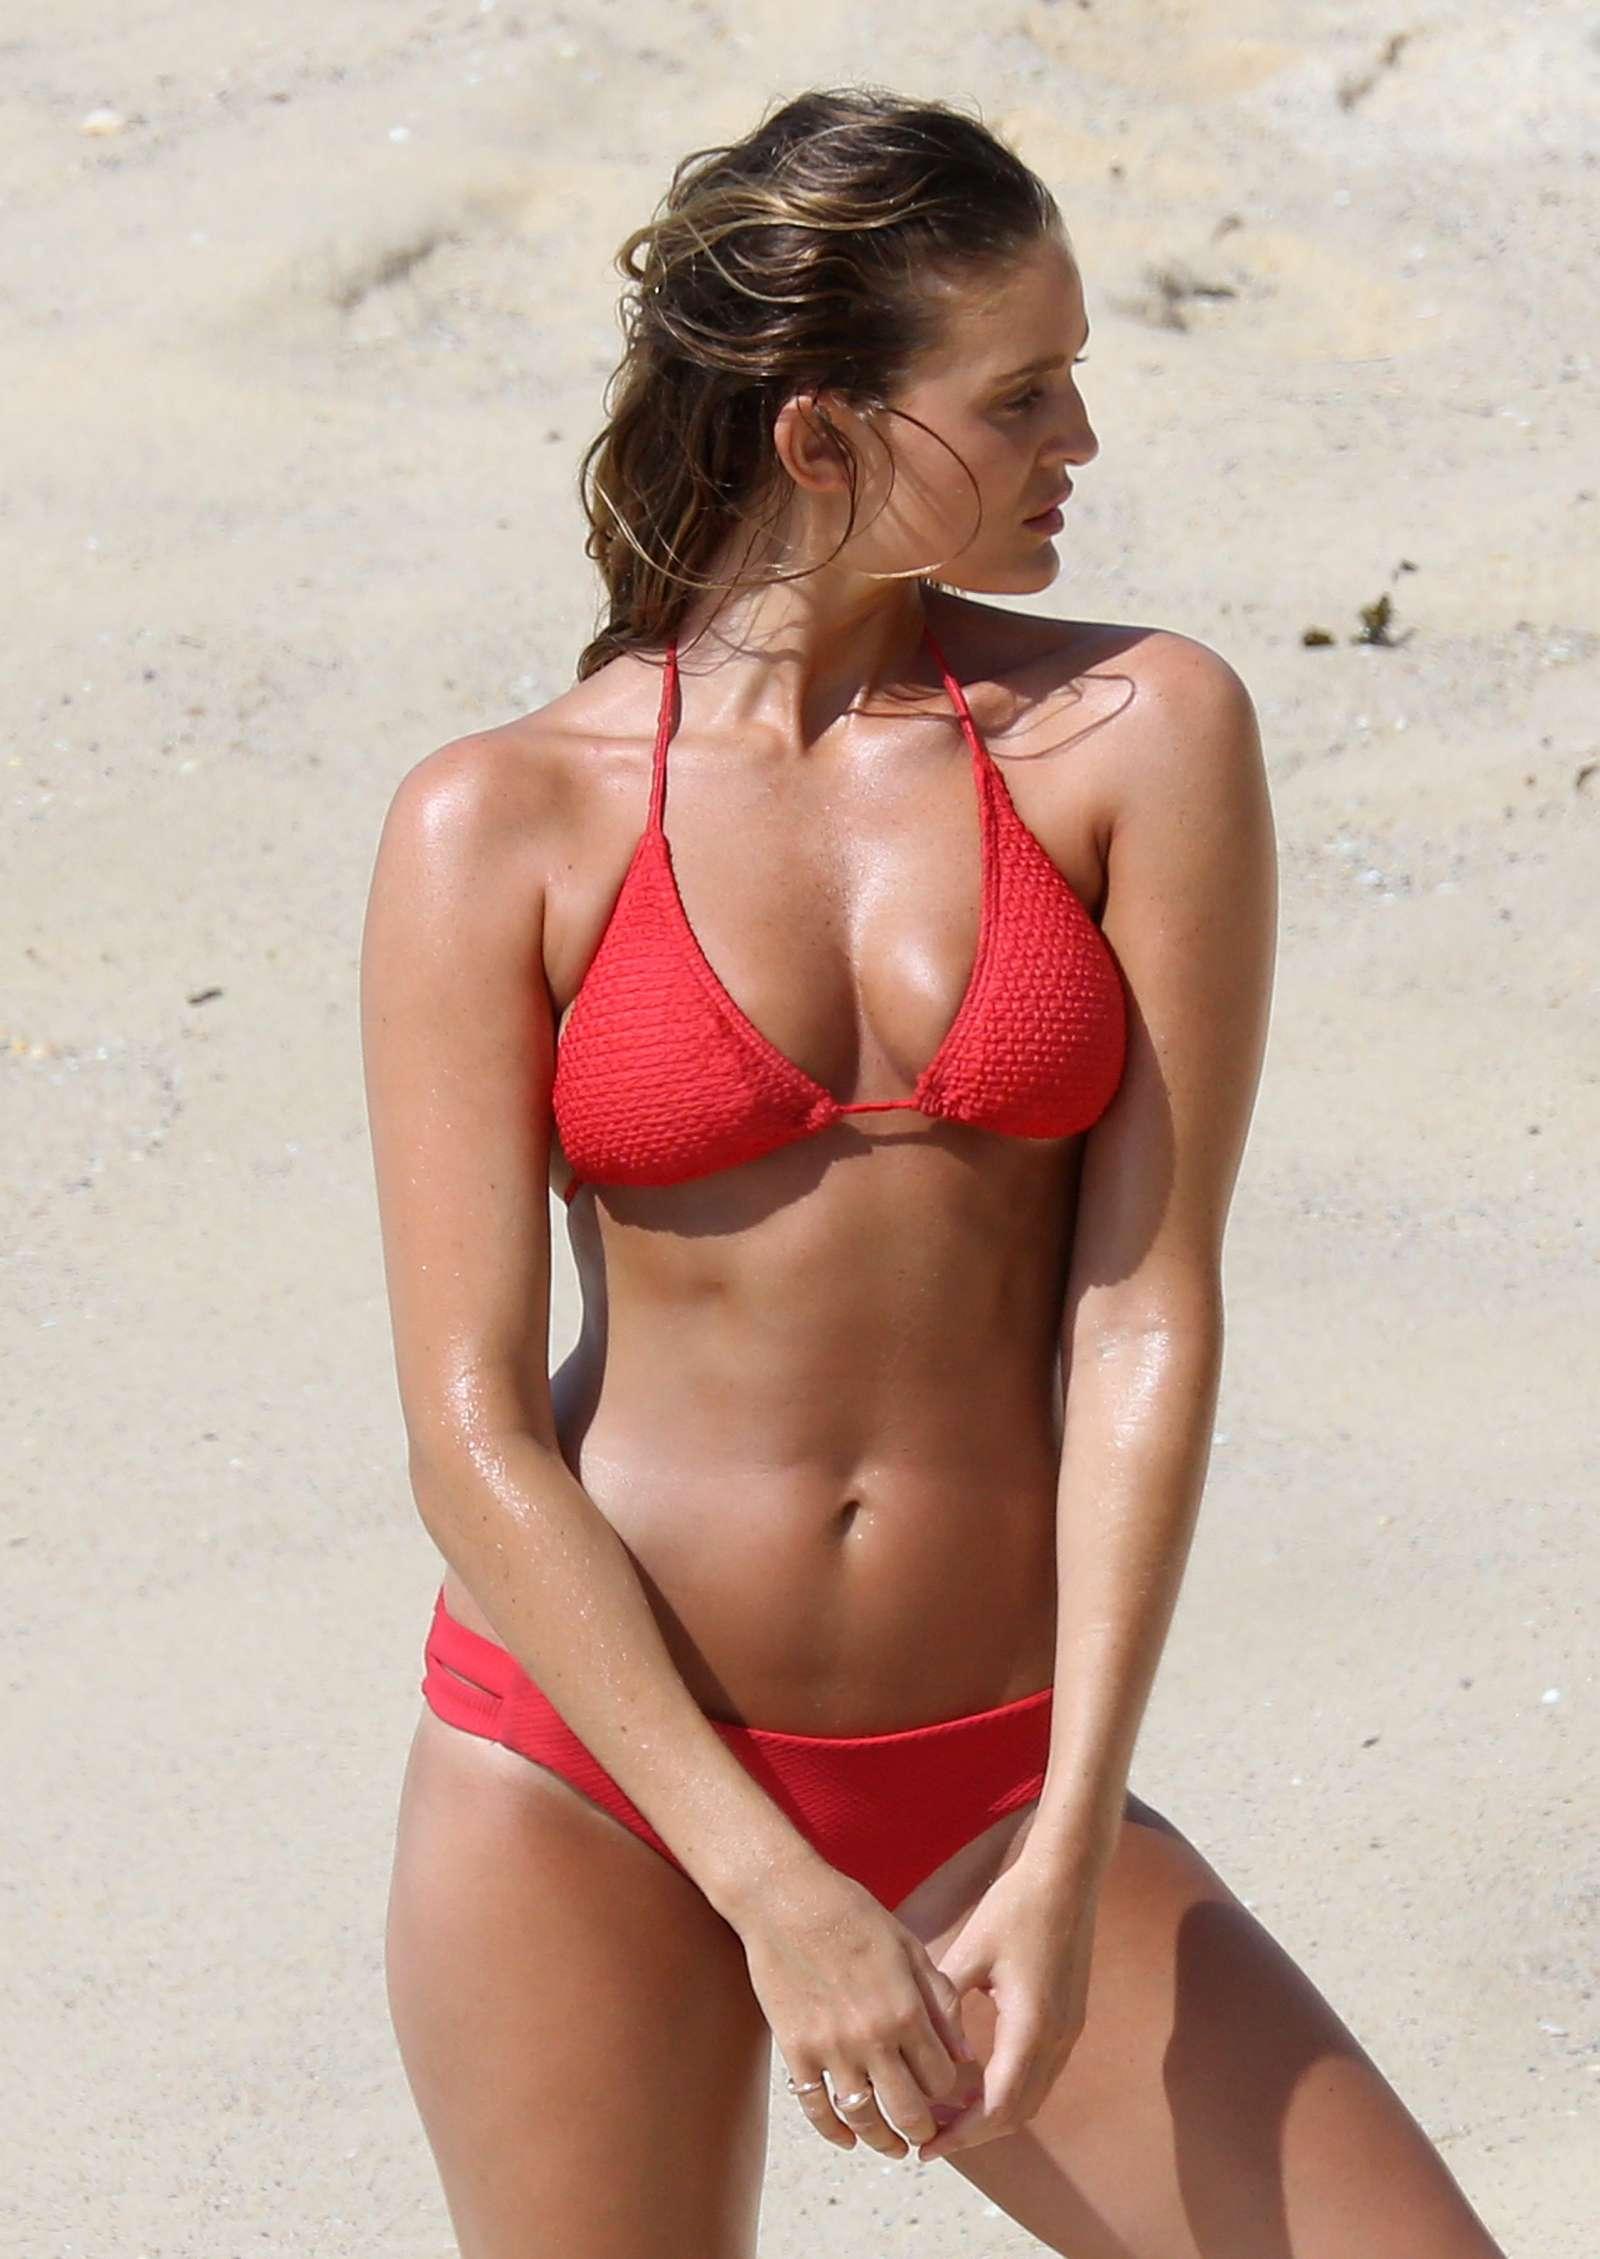 Akcent red bikini